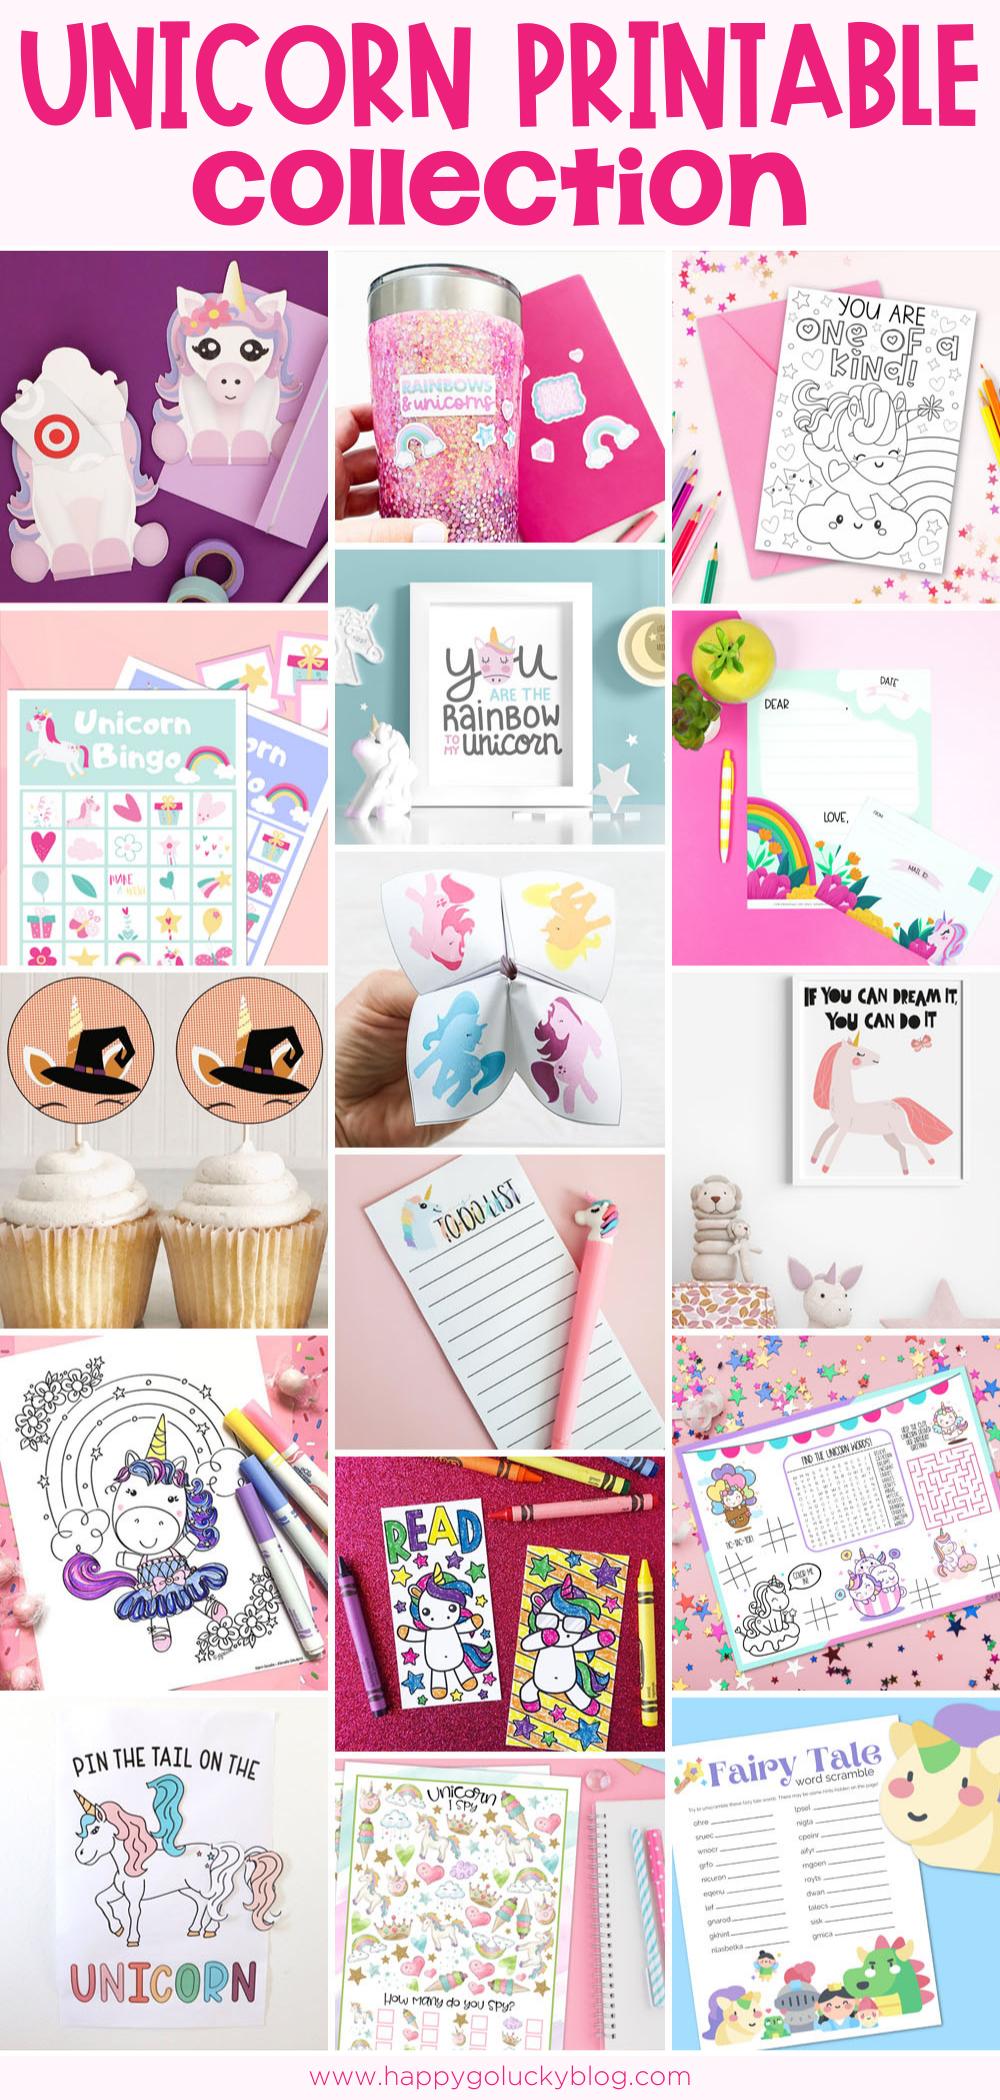 Free Unicorn Printable Collection